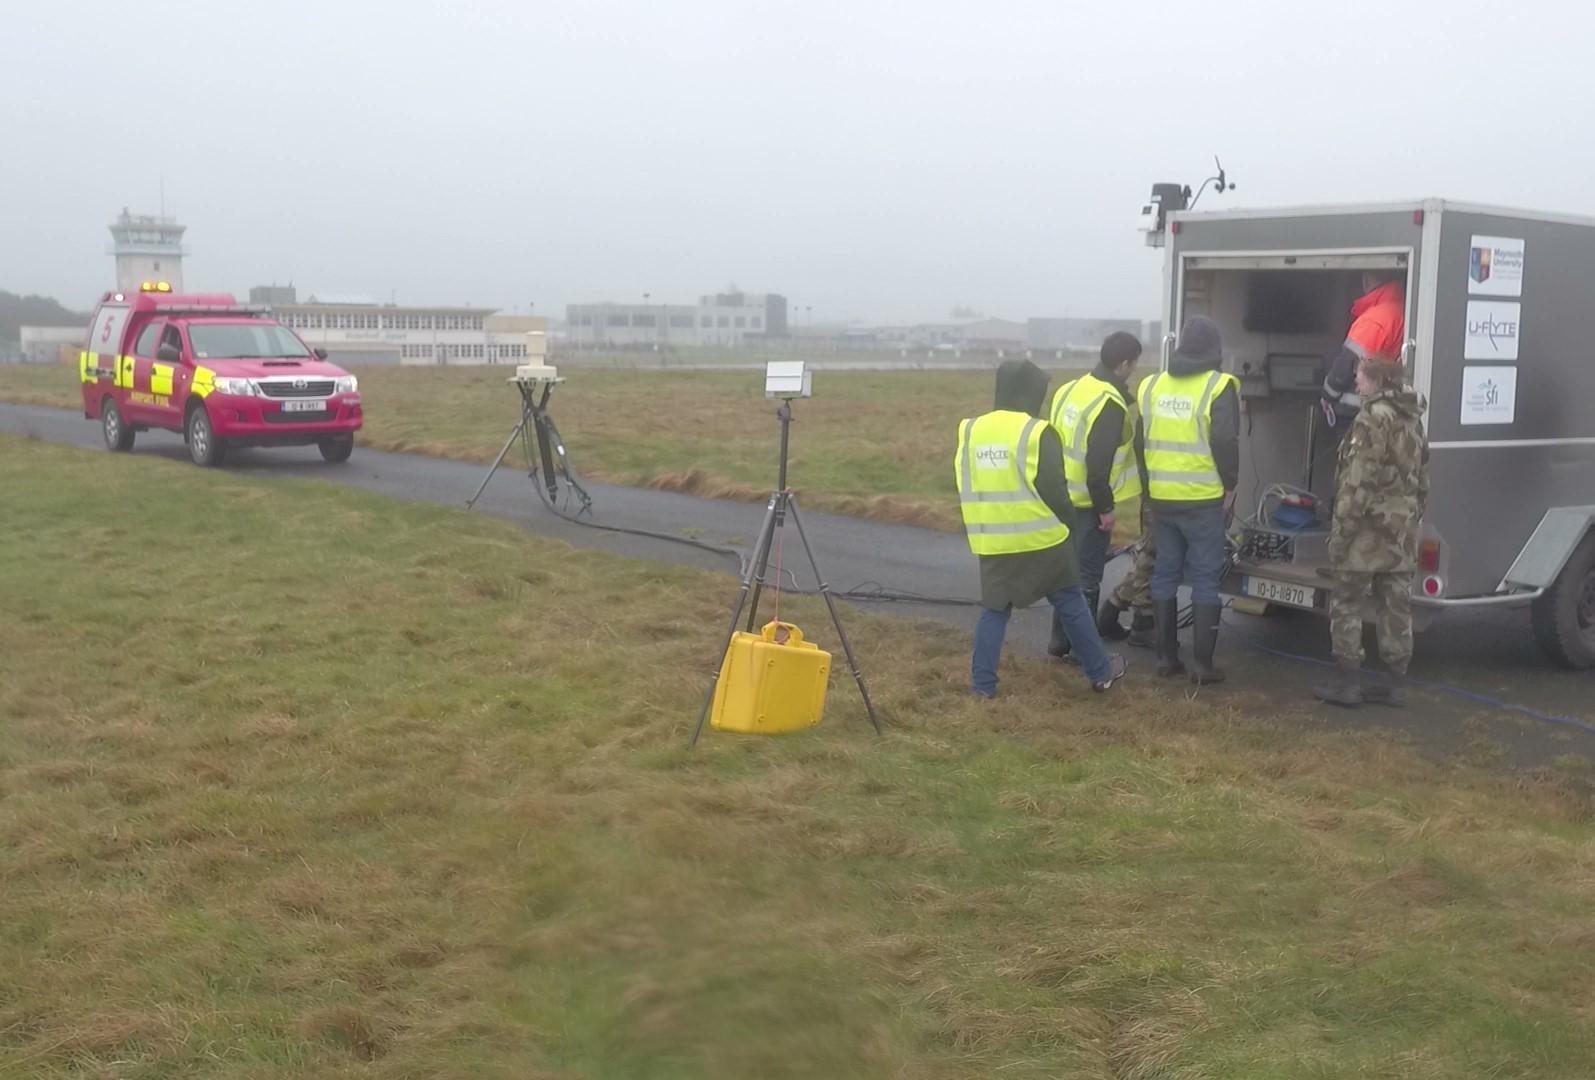 Radar and RF technology testing